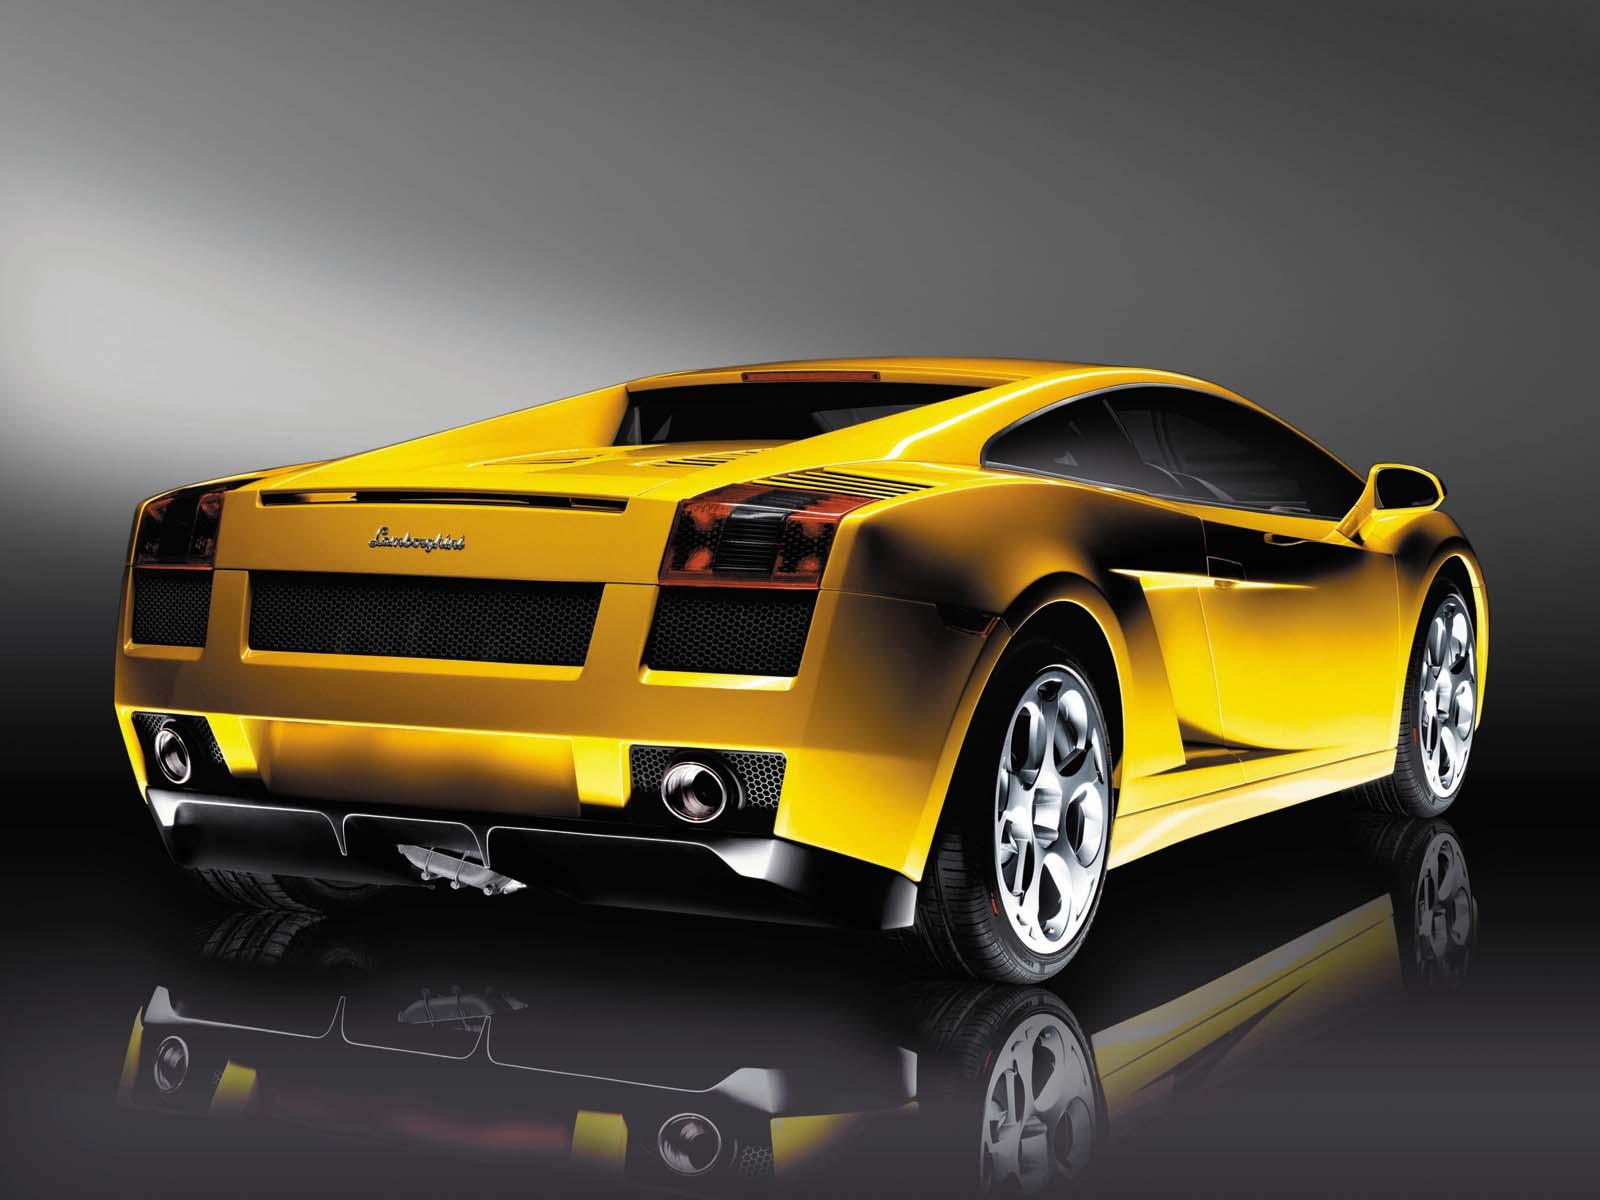 Wallpaper Mobil Lamborghini Keren - 2003 Lamborghini Gallardo , HD Wallpaper & Backgrounds